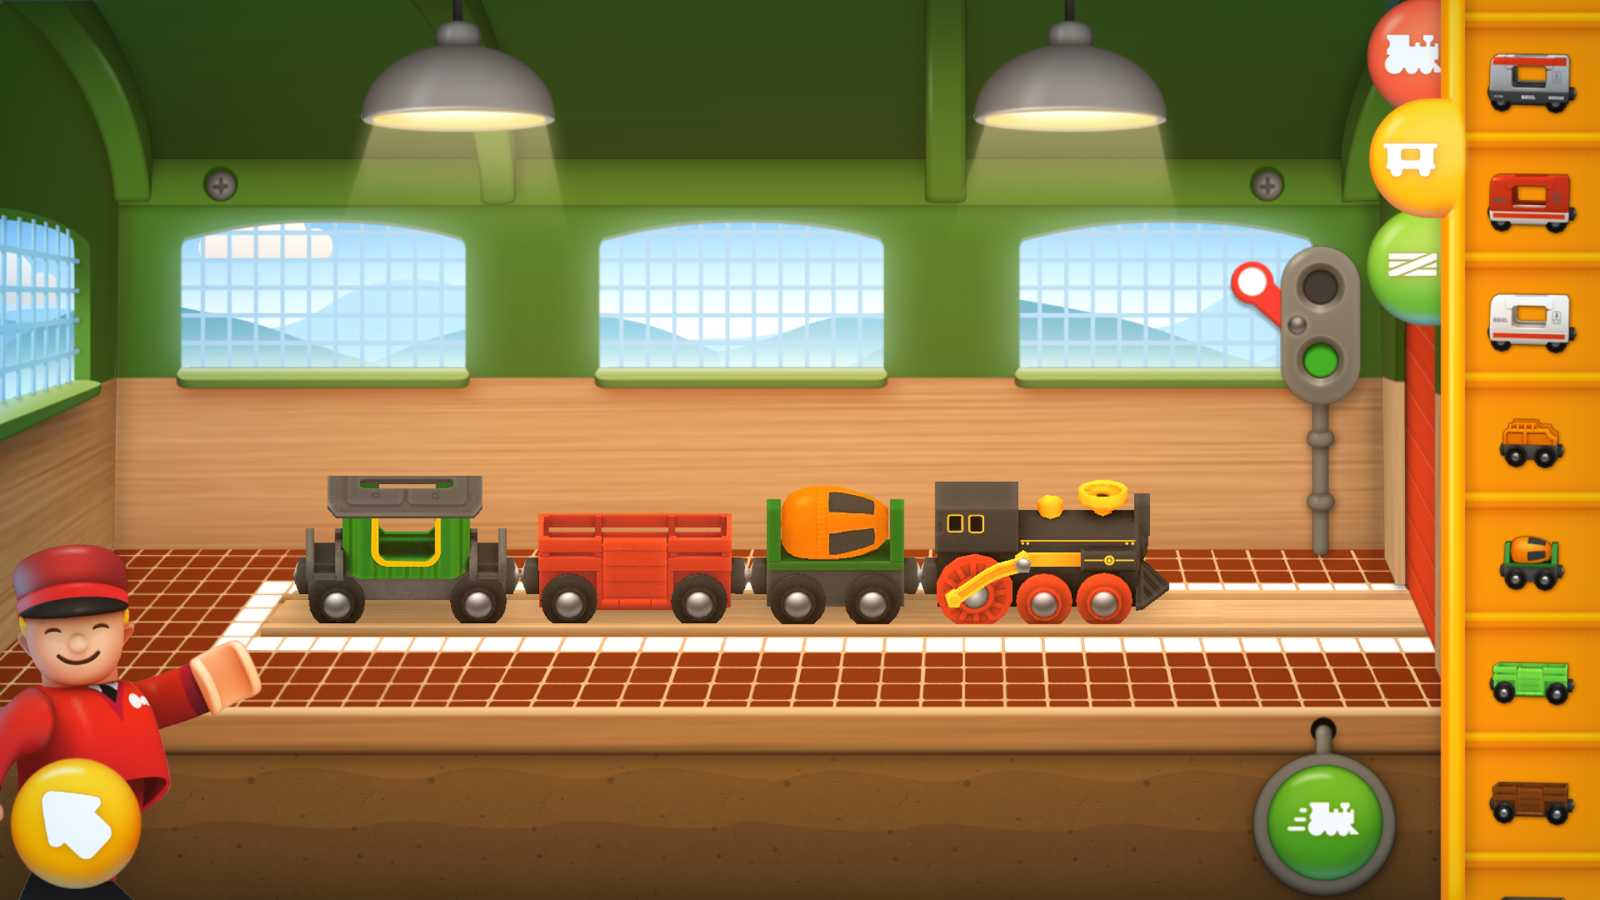 download game toca train apk